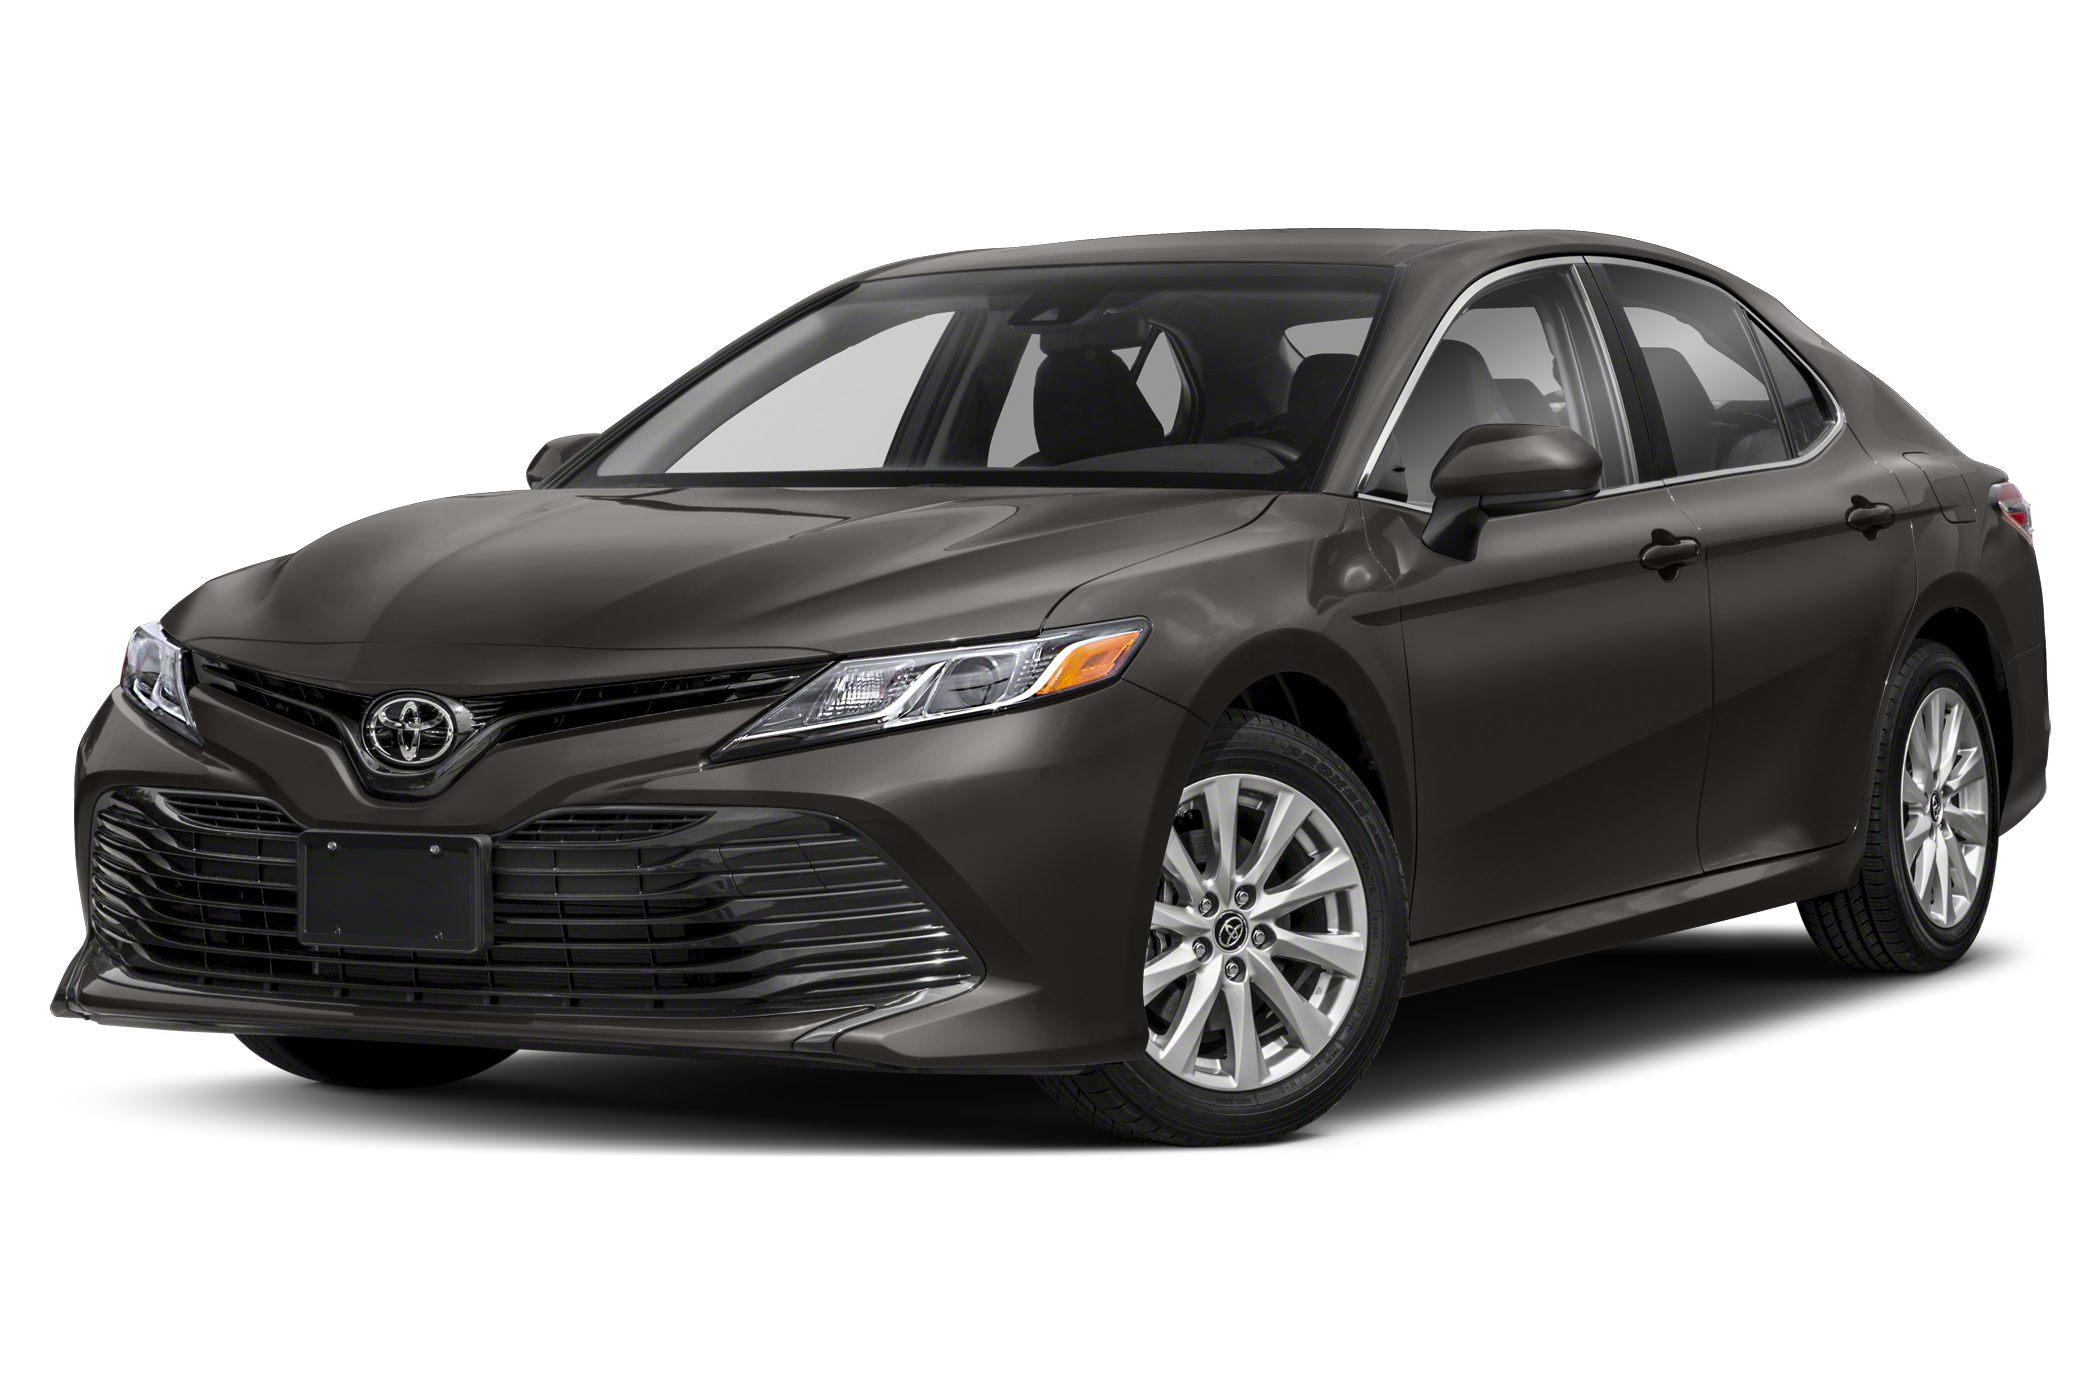 all new camry interior grand avanza semisena 2019 toyota le 4dr sedan specs and prices